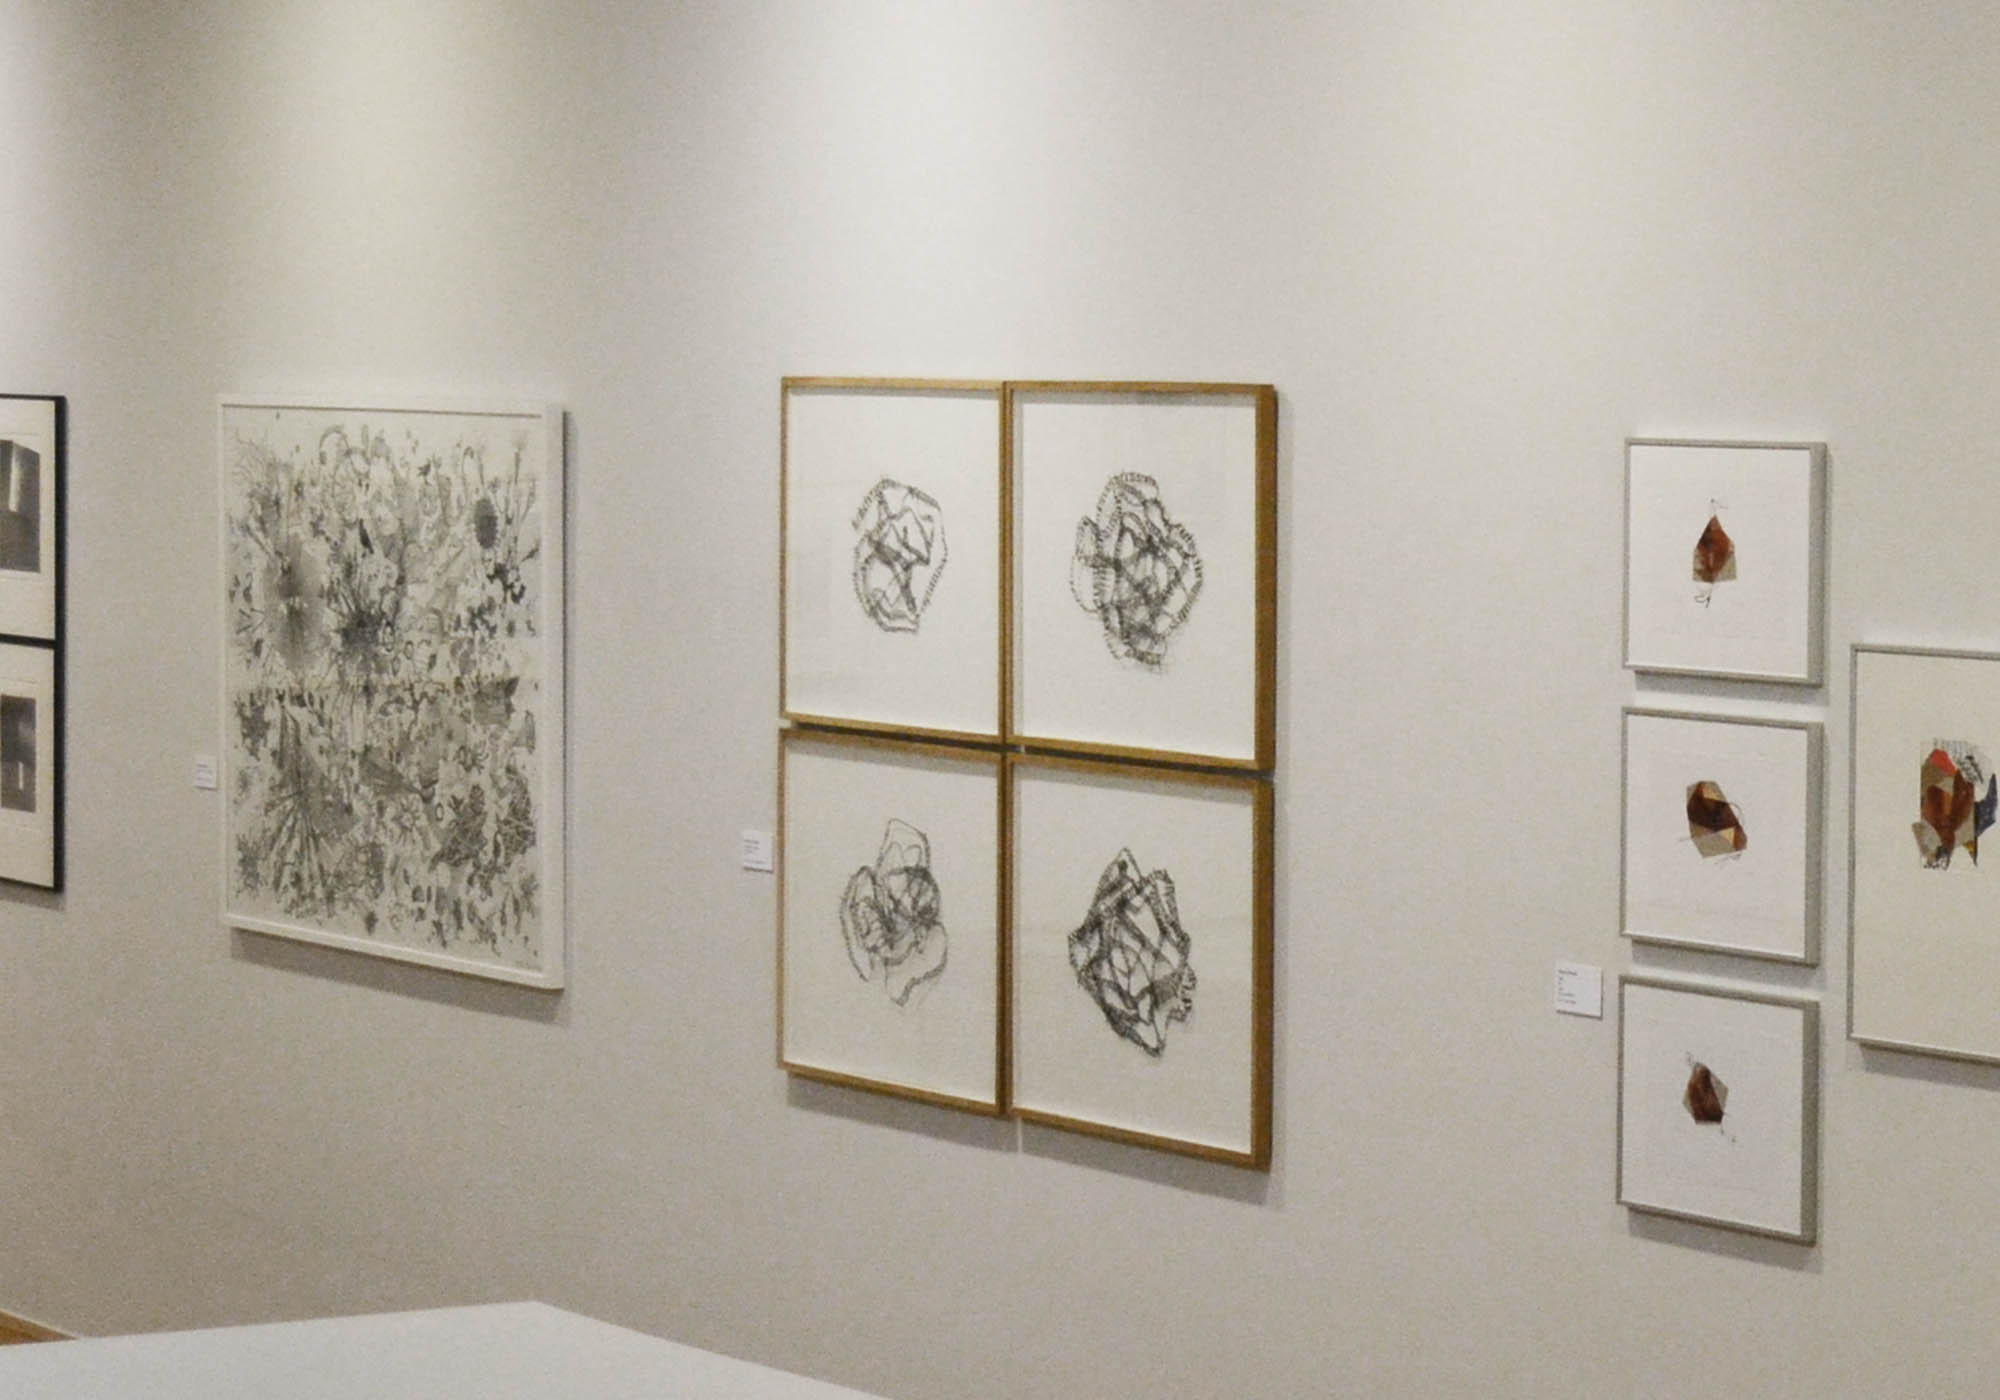 Ausstellungsansicht Kunstmuseum Mülheim an der Ruhr